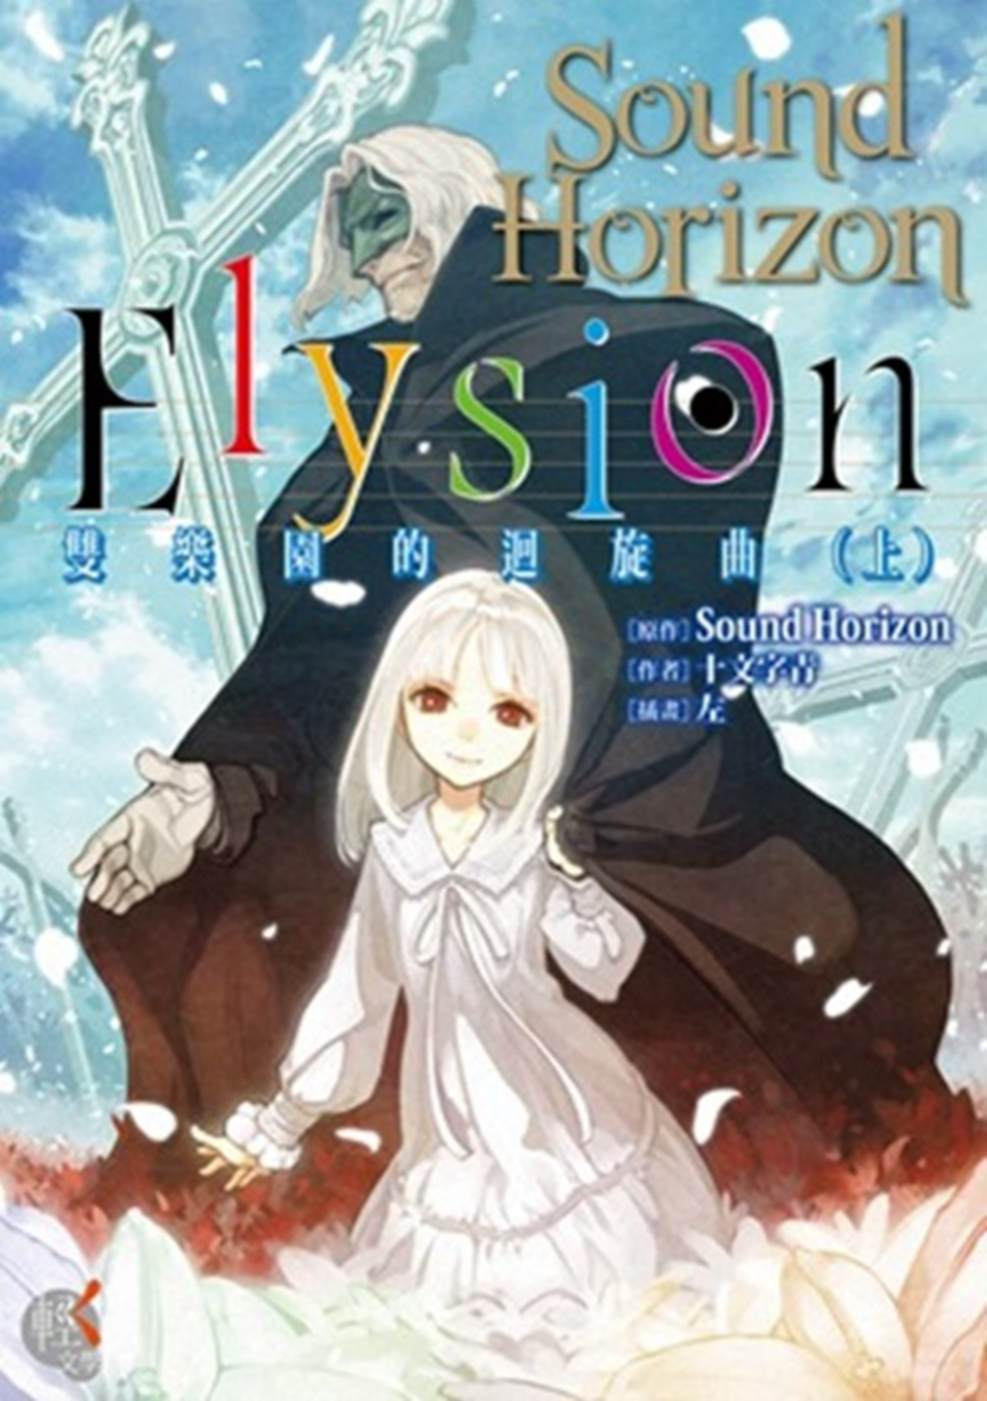 Elysion 雙樂園的迴旋曲(上)